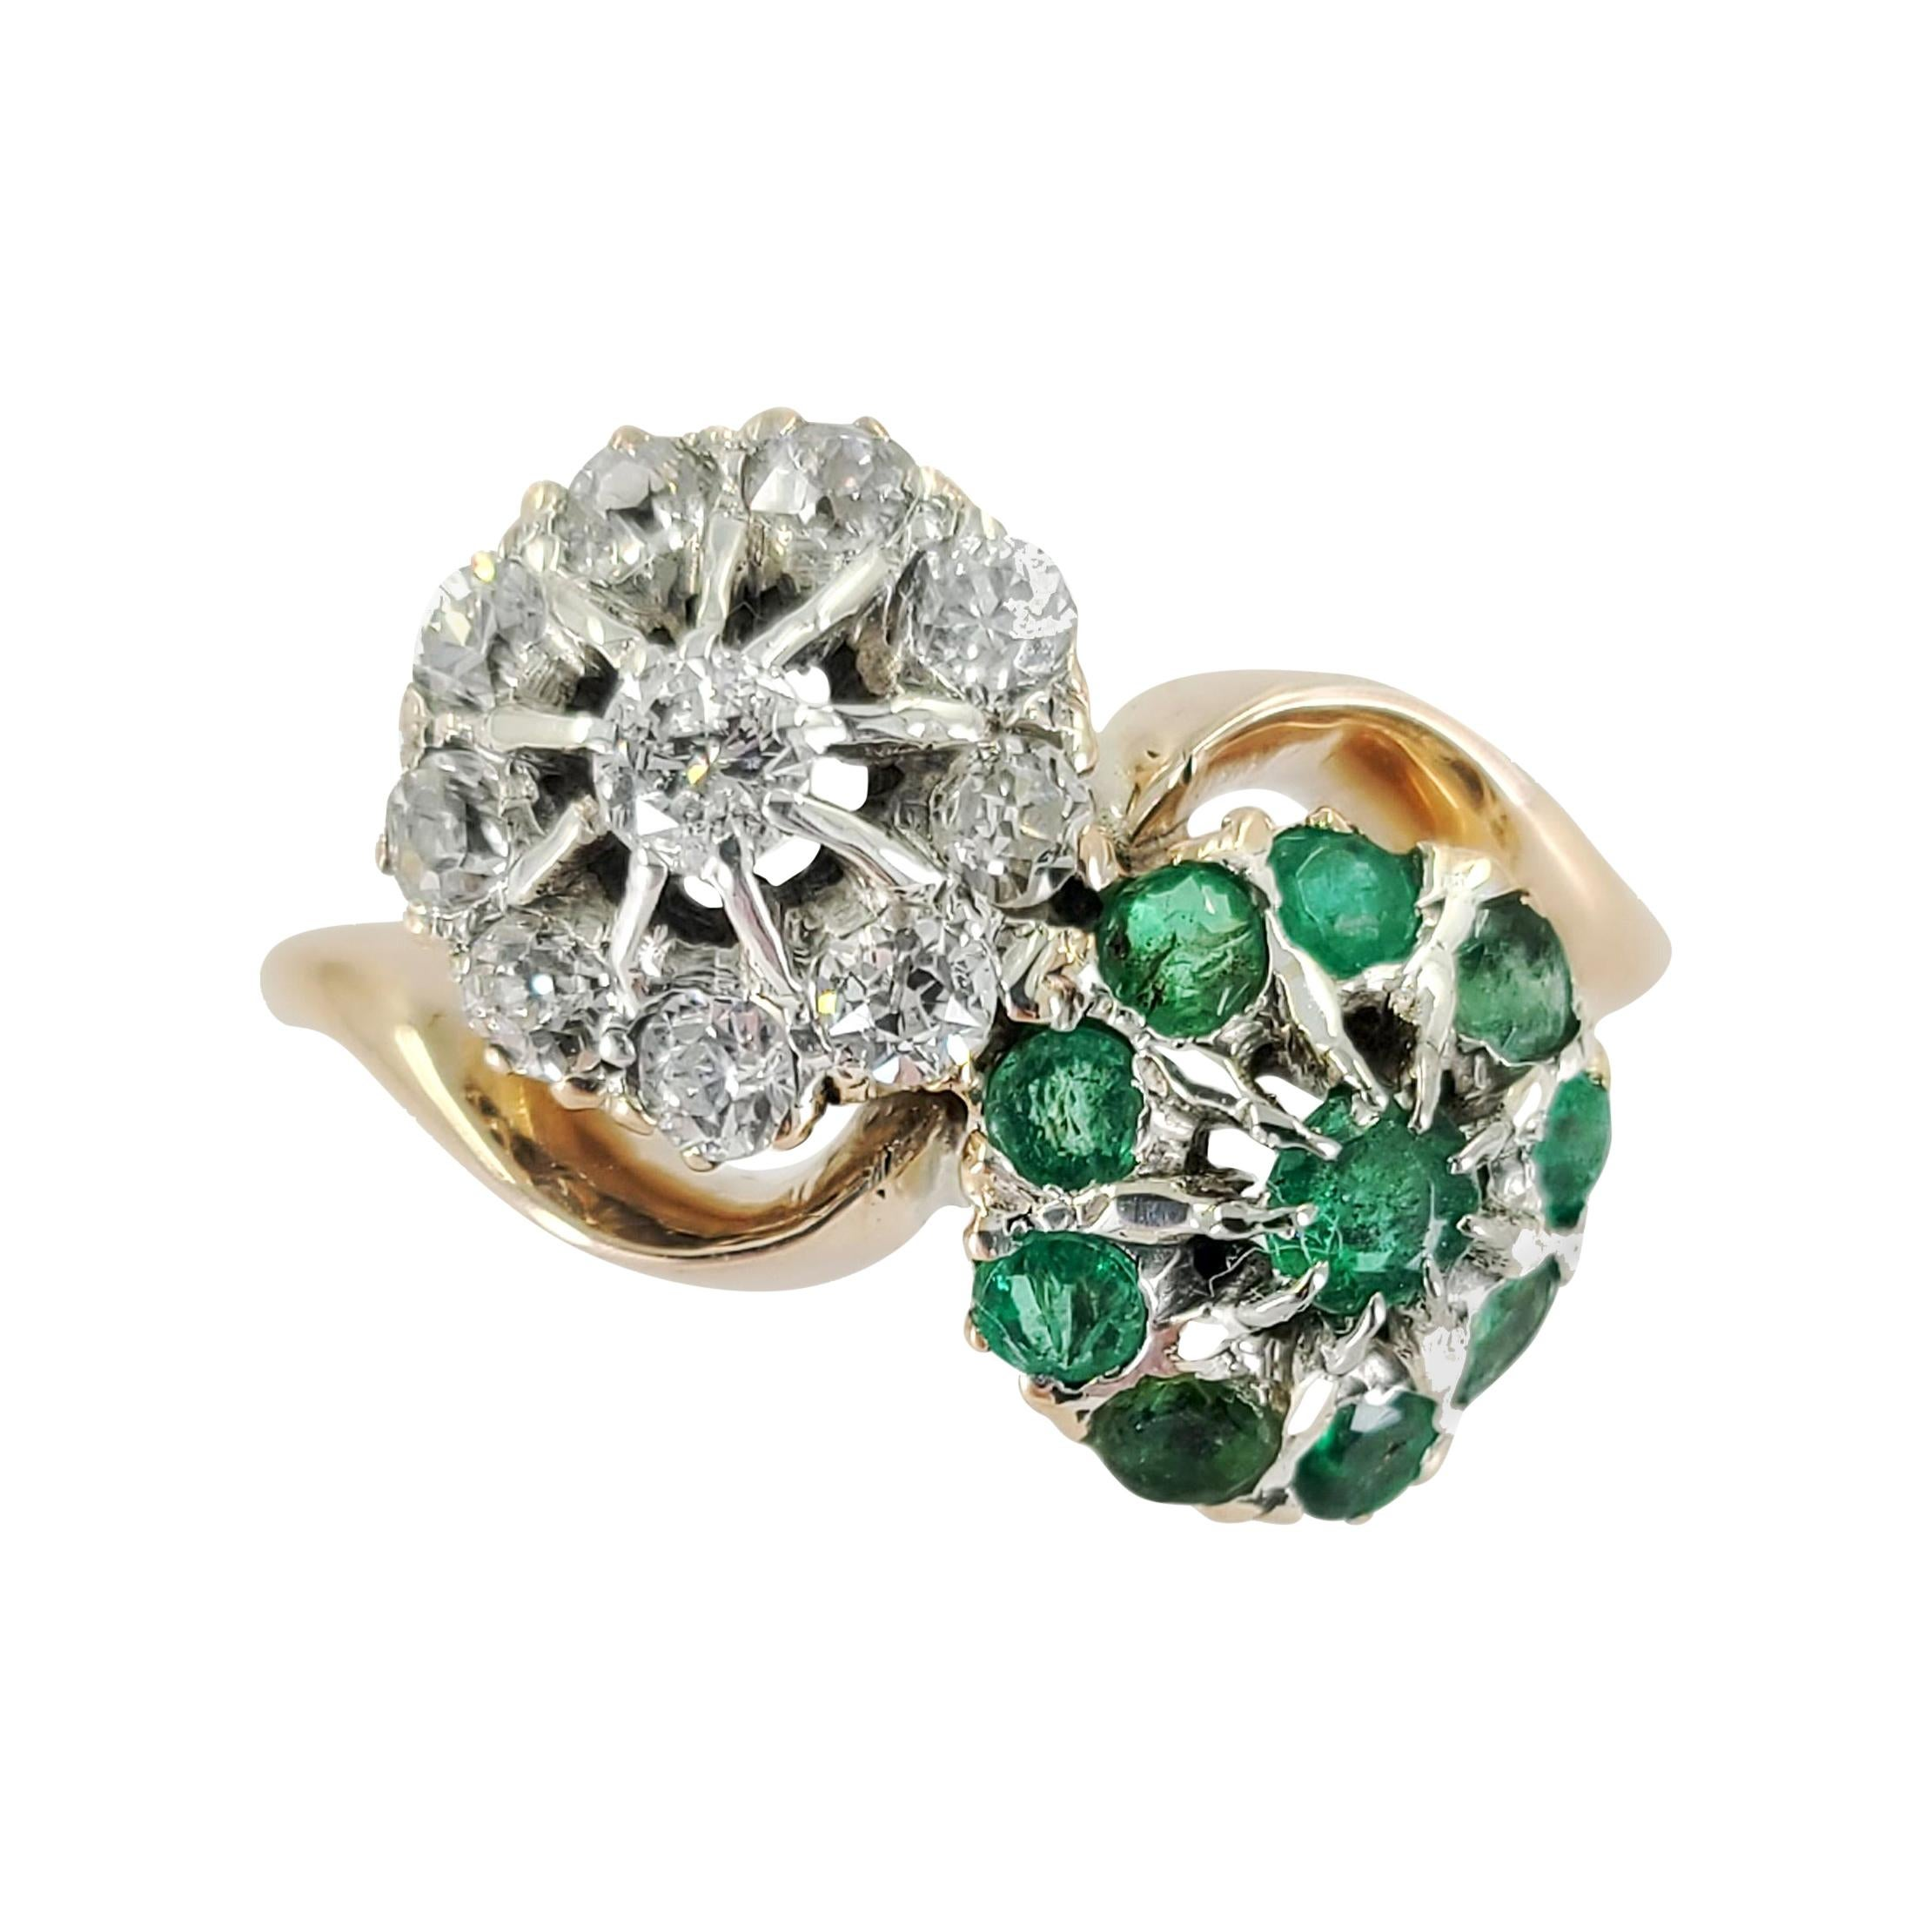 Antique 18 Karat Gold Emerald & Diamond Cluster Ring